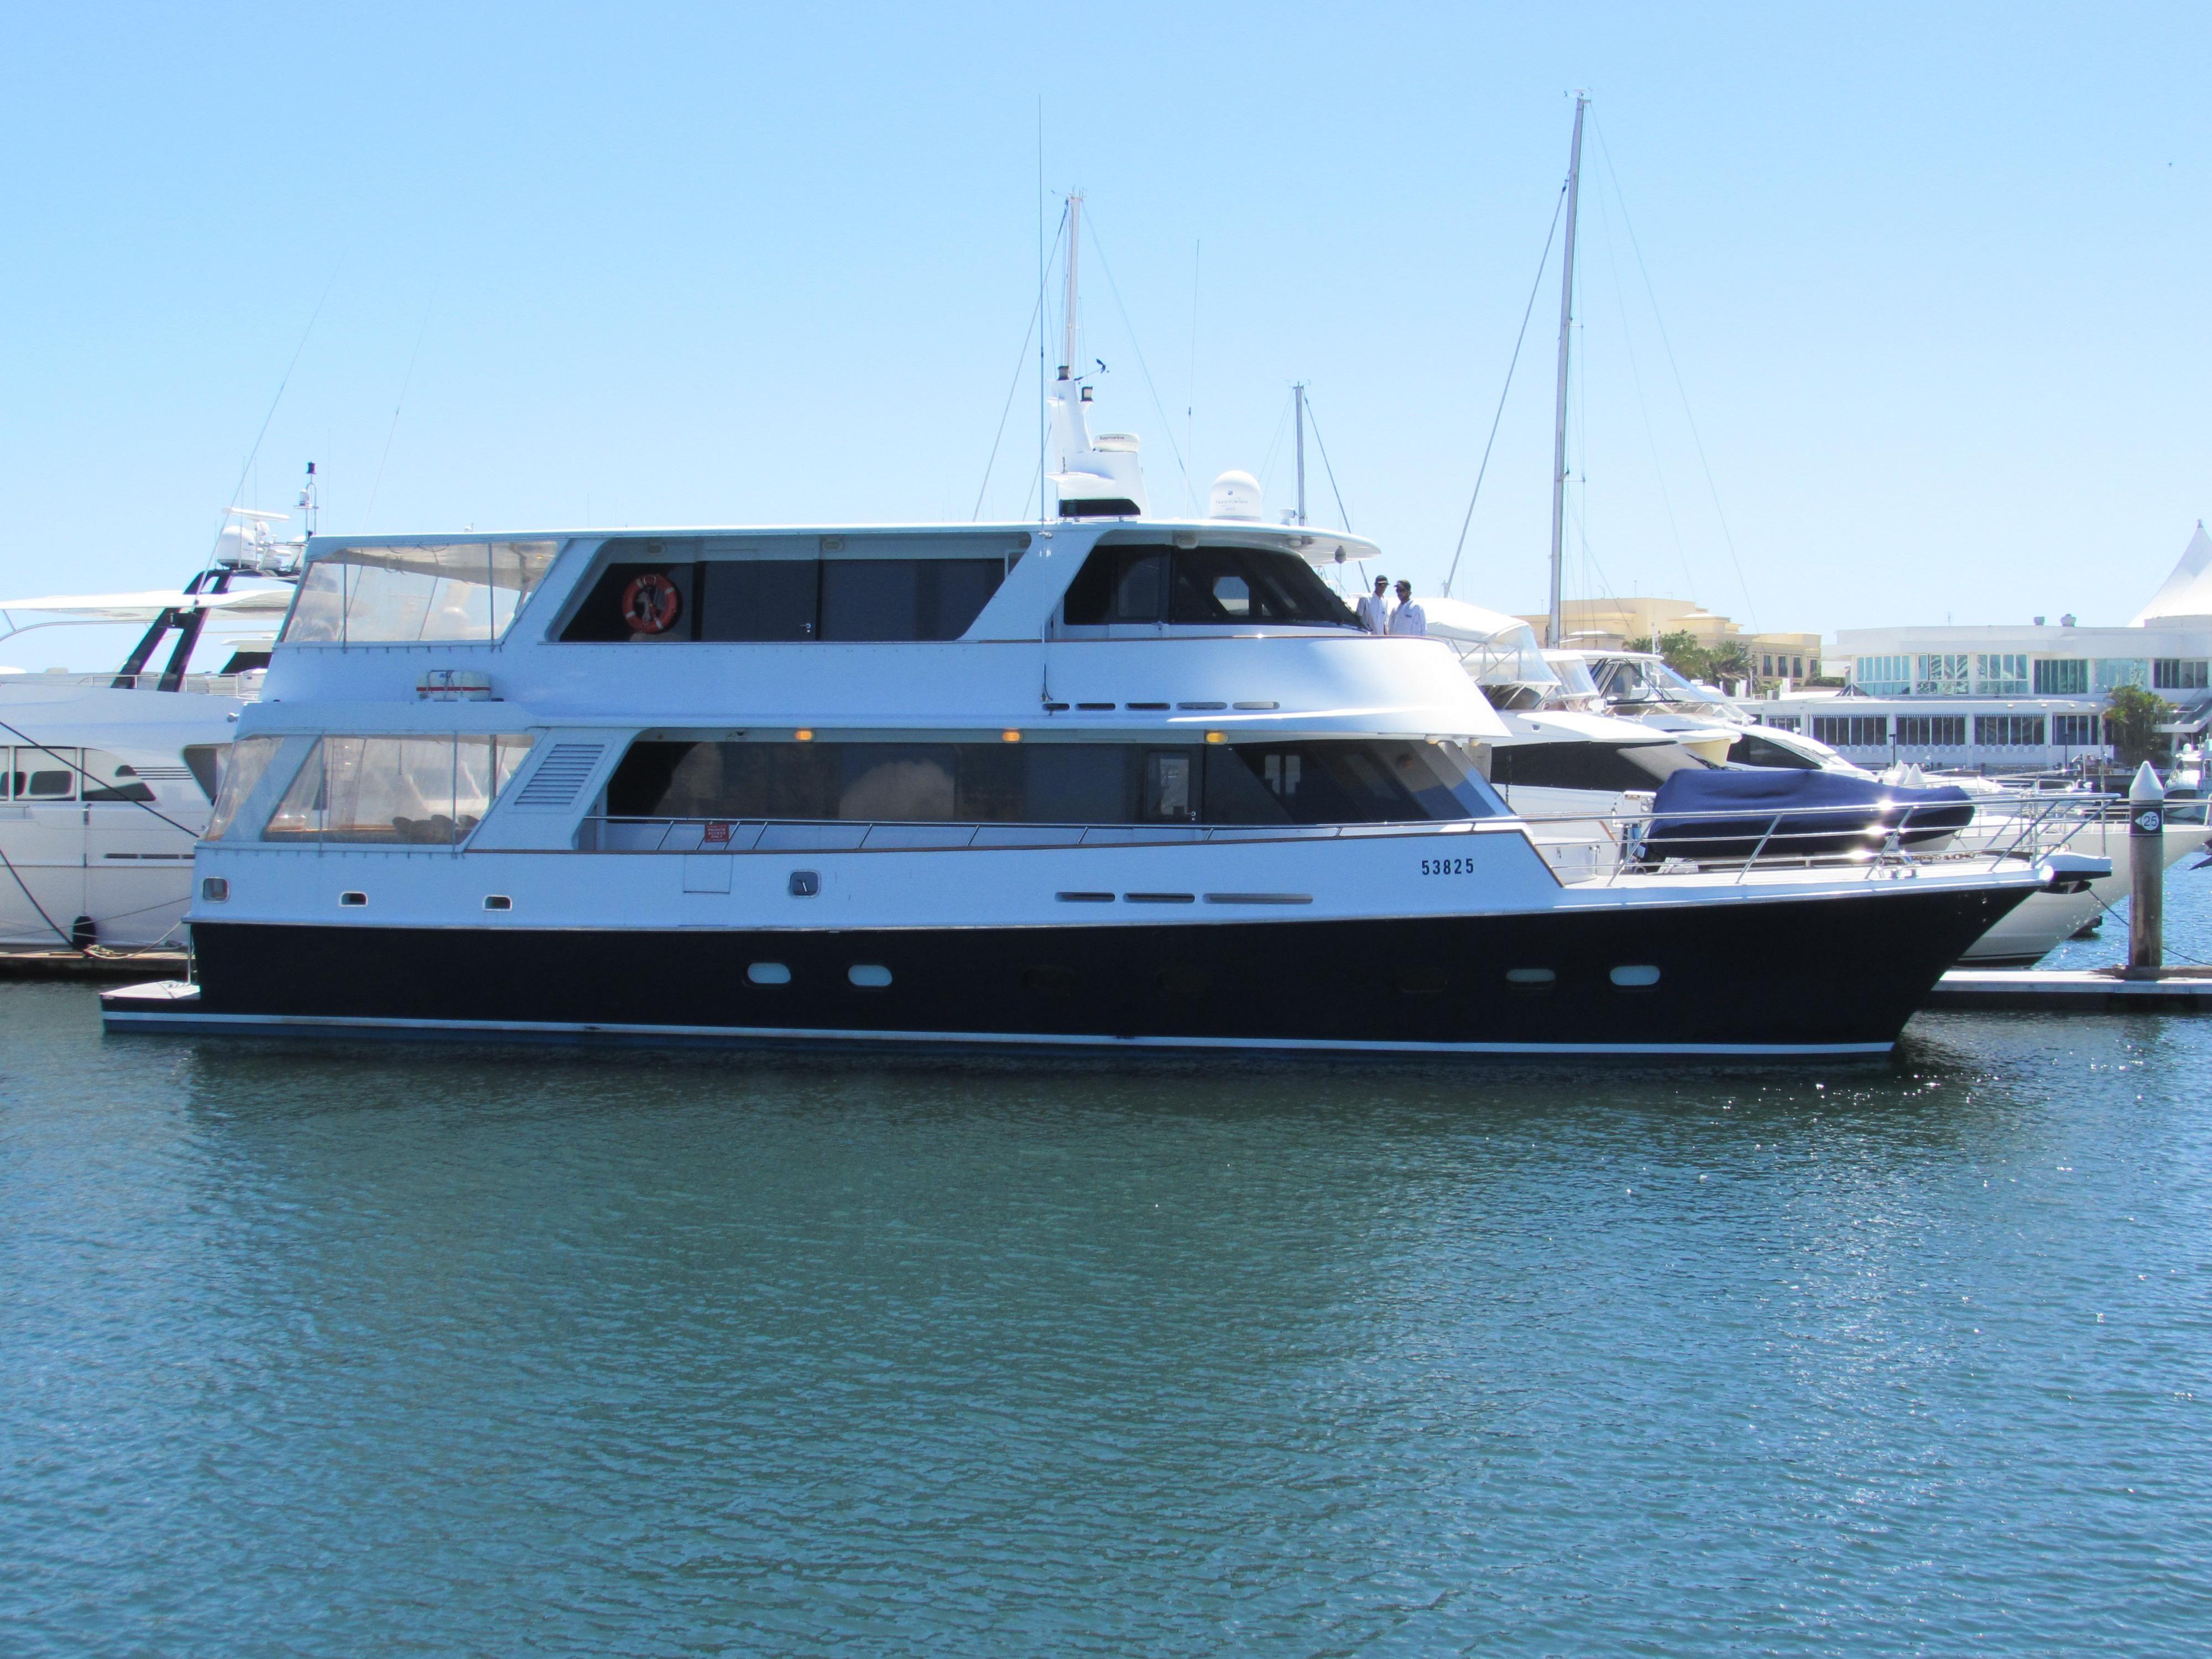 1986 86 39 luxury catamaran motor yacht power boat for sale for Luxury motor boats for sale